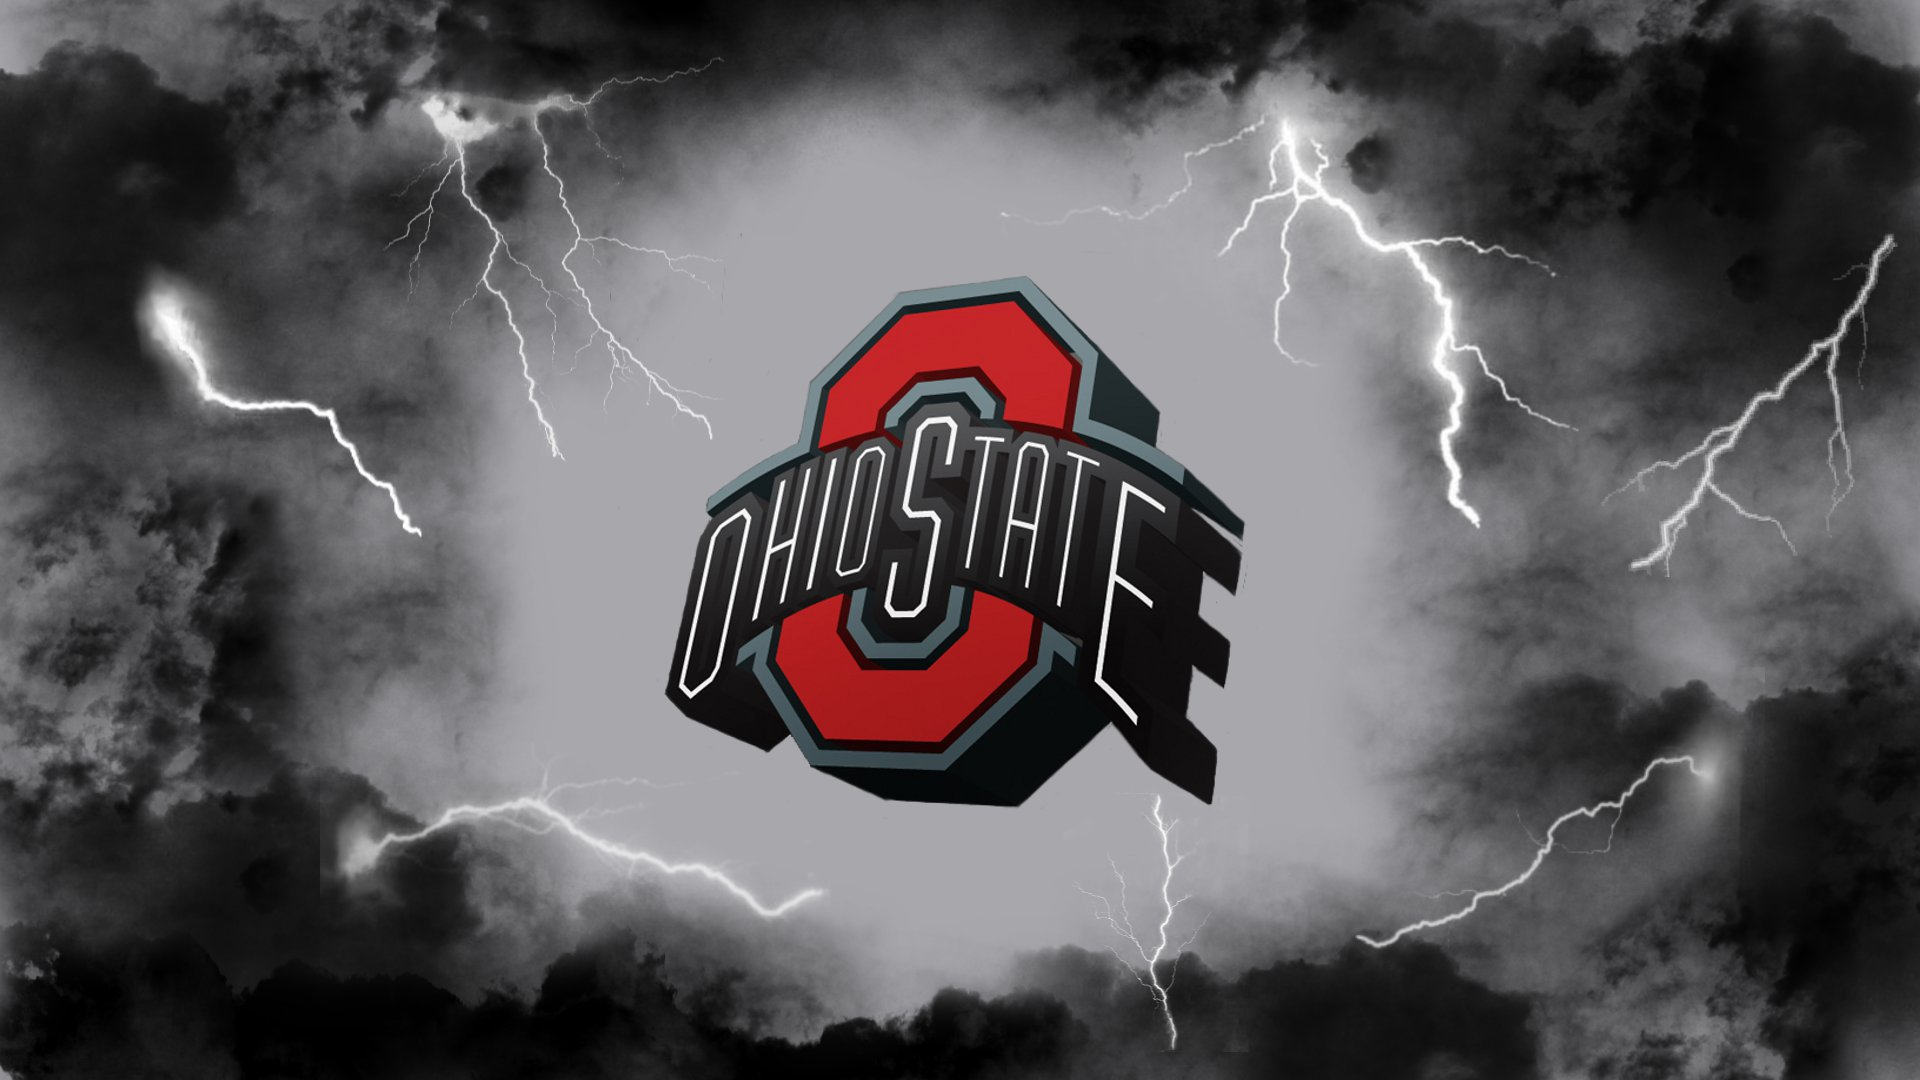 OSU Wallpaper 62 - Ohio State Football Wallpaper (28972376) - Fanpop